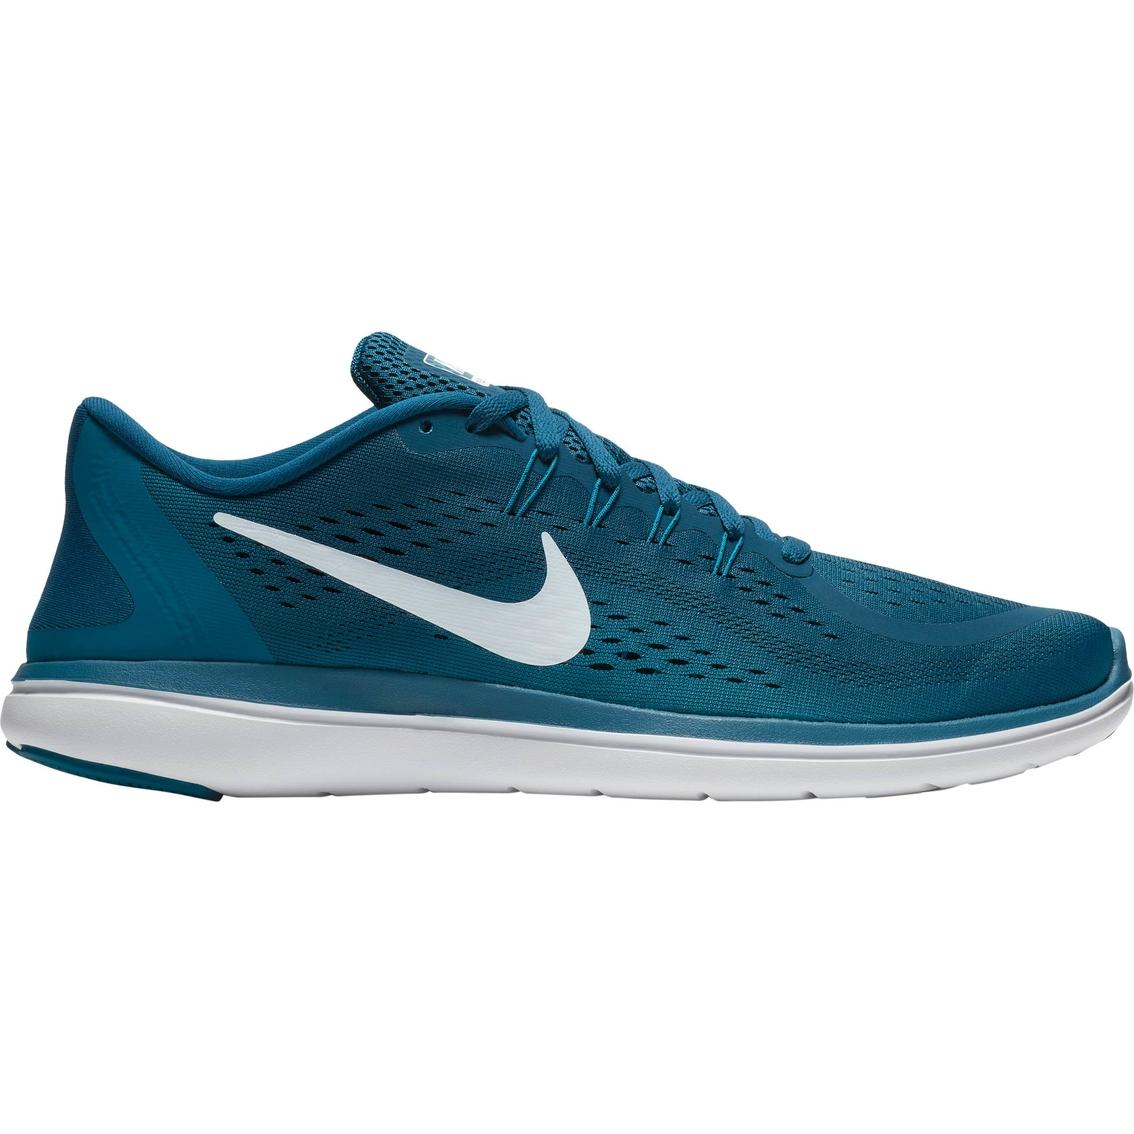 6d99970f92cd Nike Men s Flex 2017 Rn Running Shoes